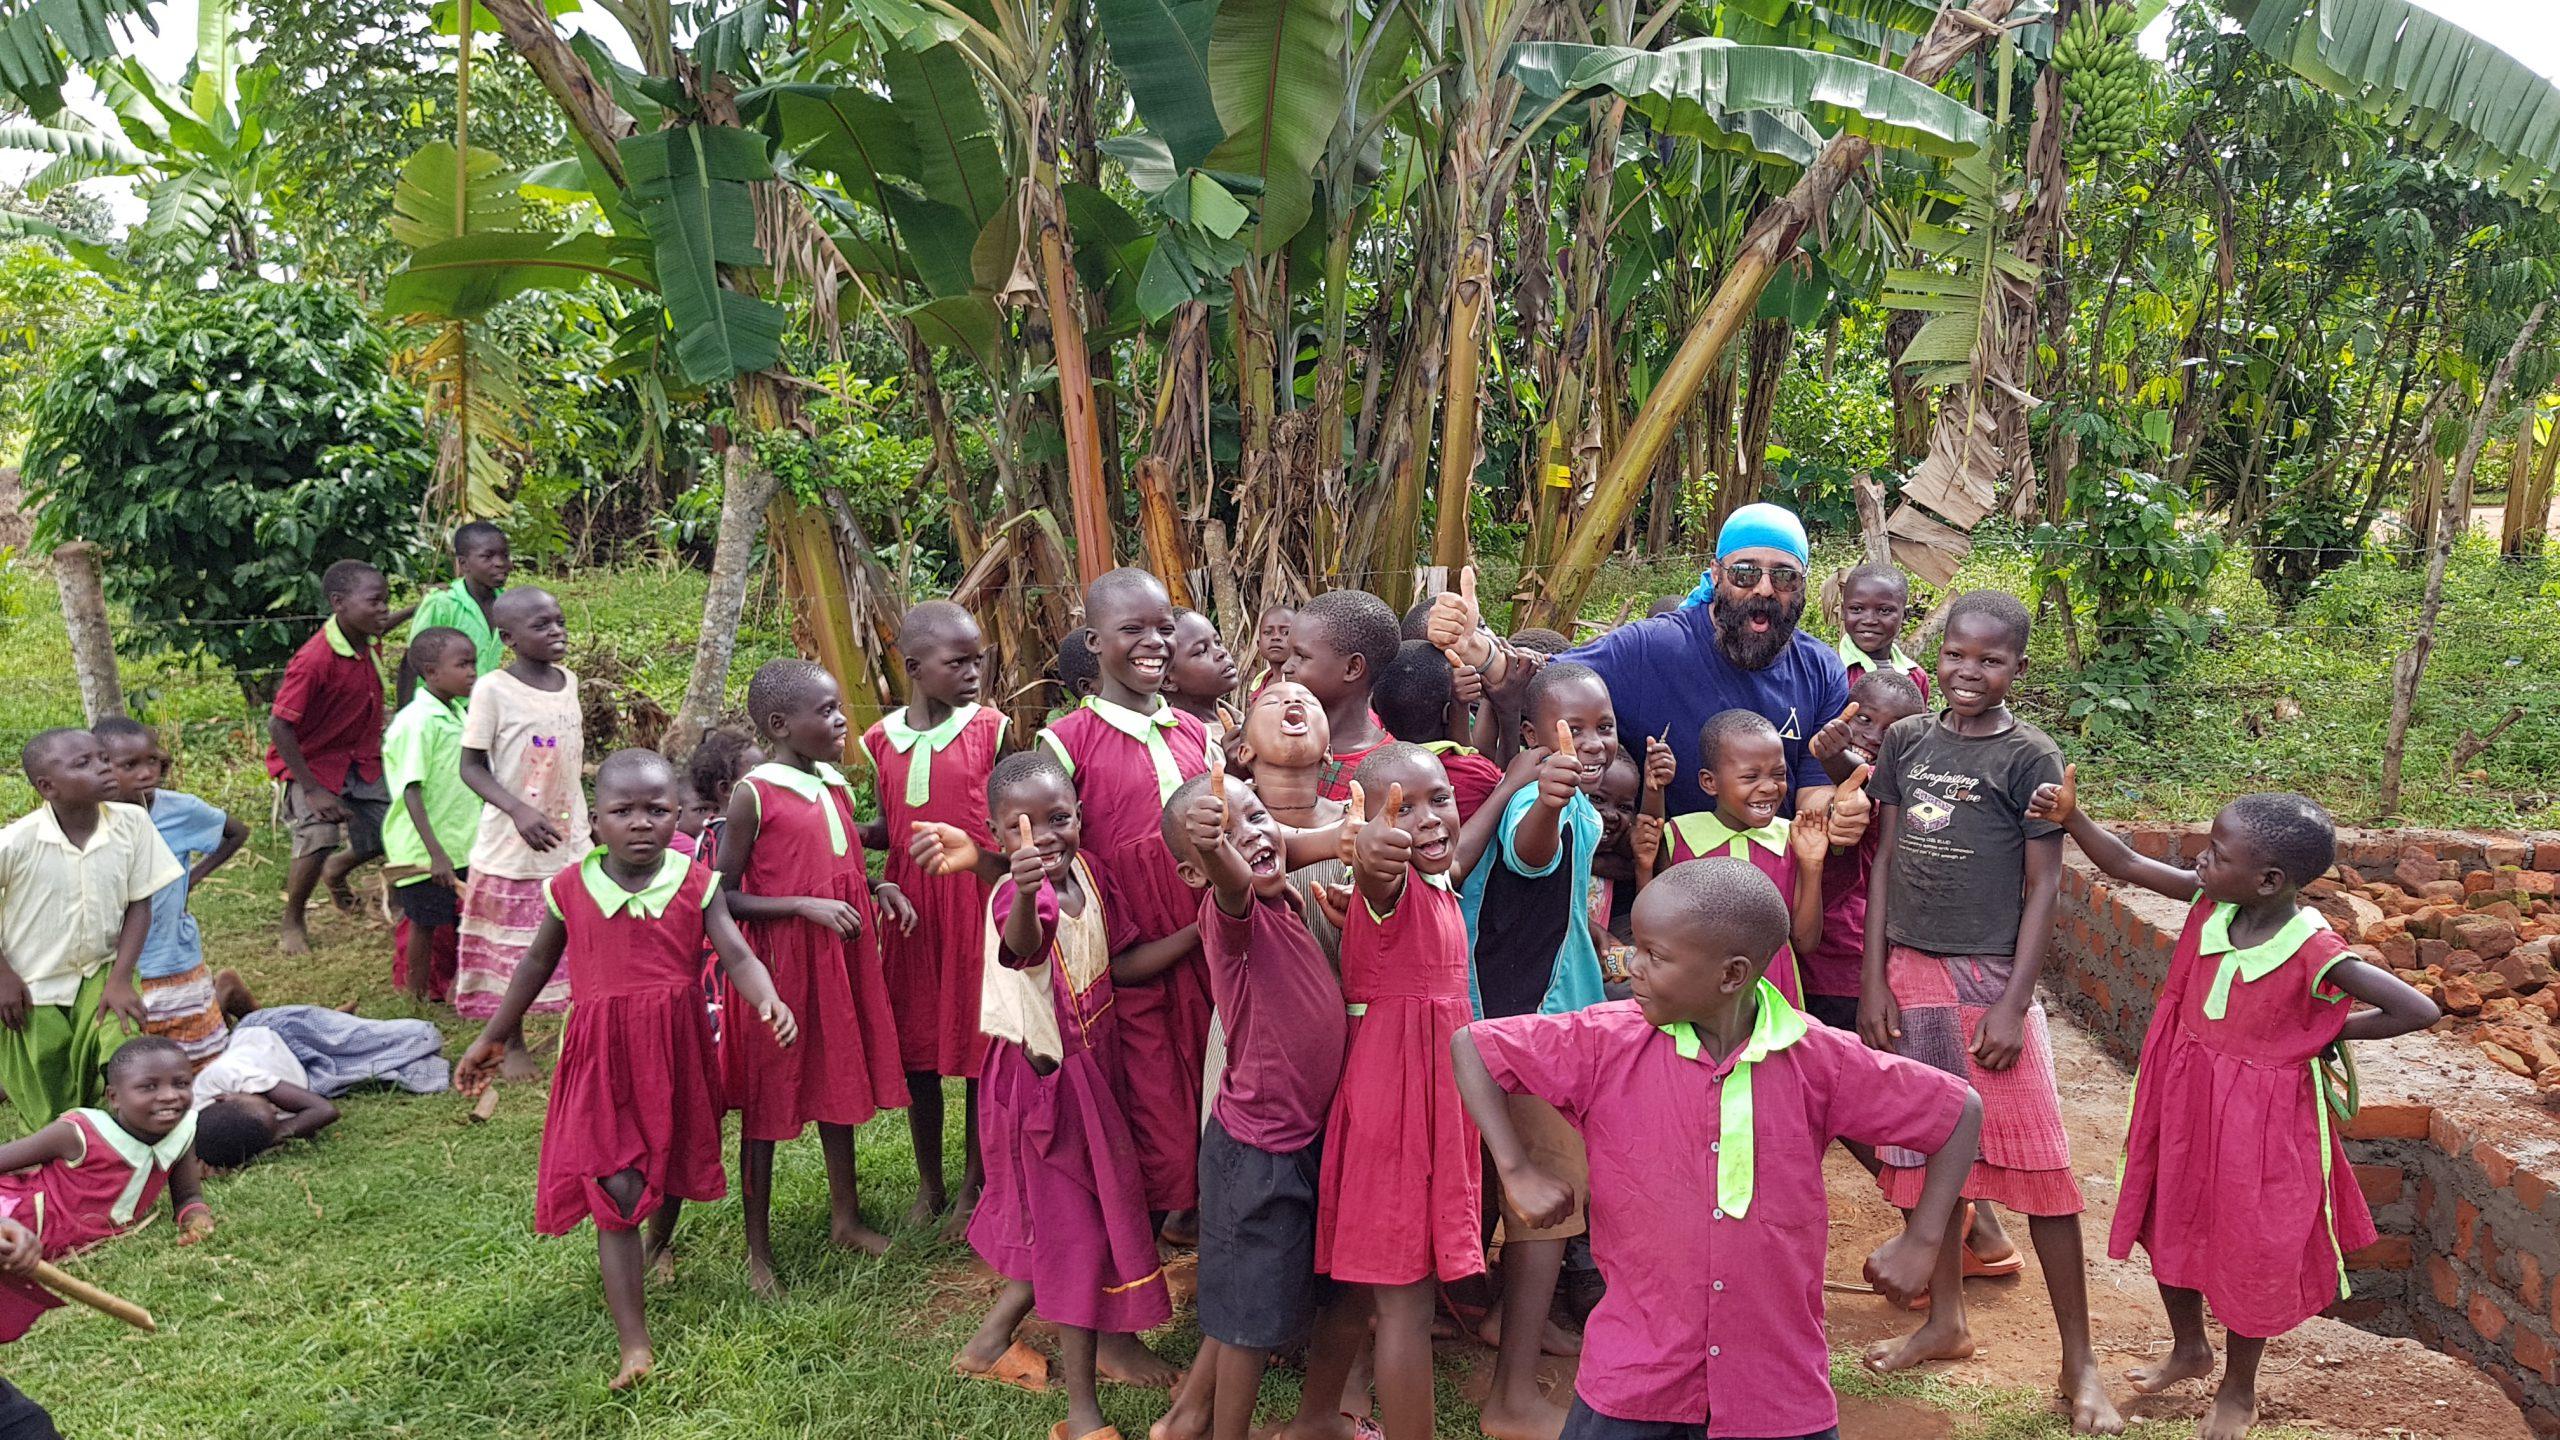 camps_international_social_enterprise_students_in_africa